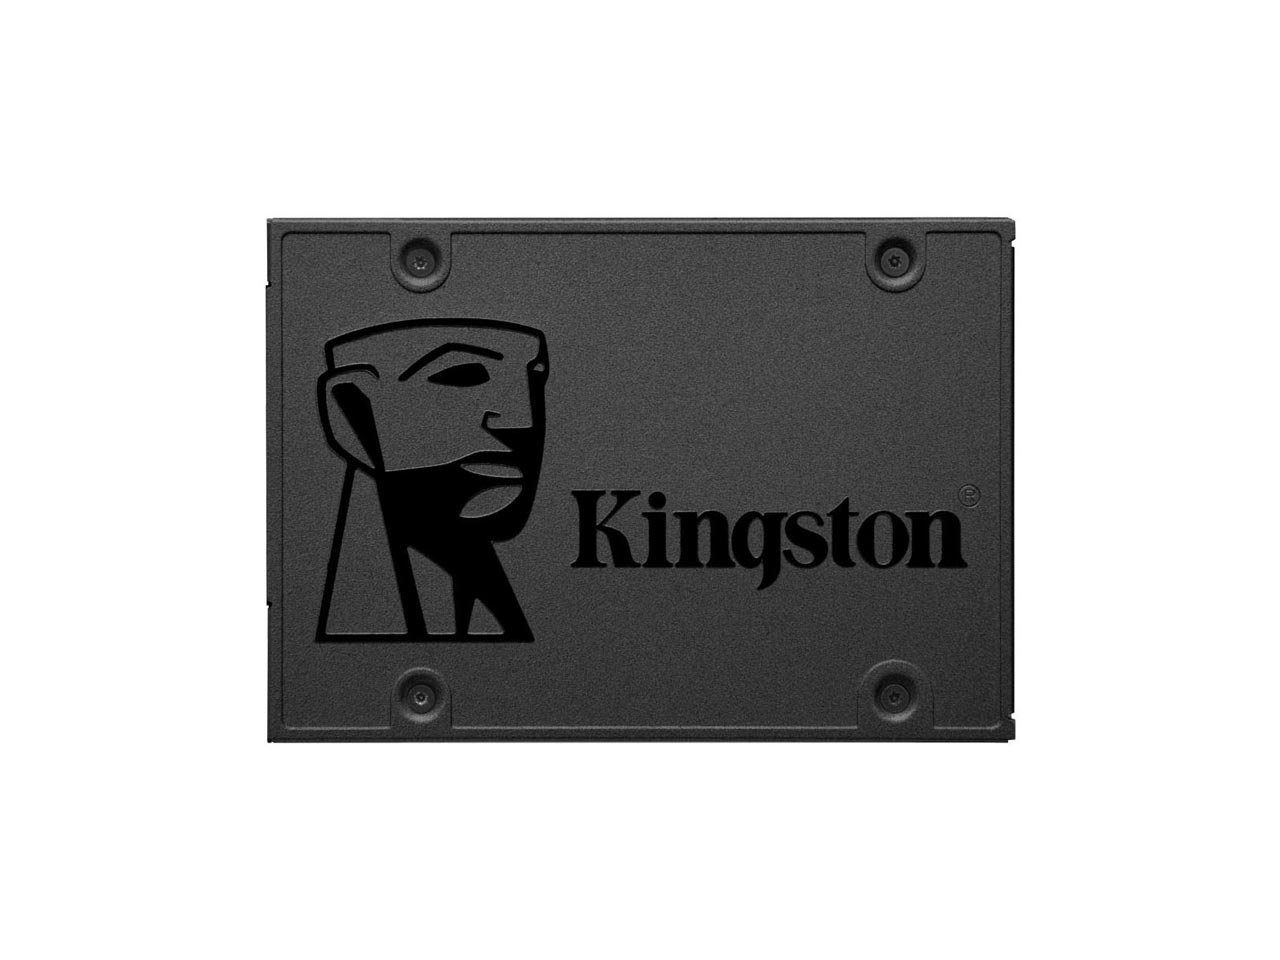 ذخیره ساز اکسترنال کینگستون A400 960GB